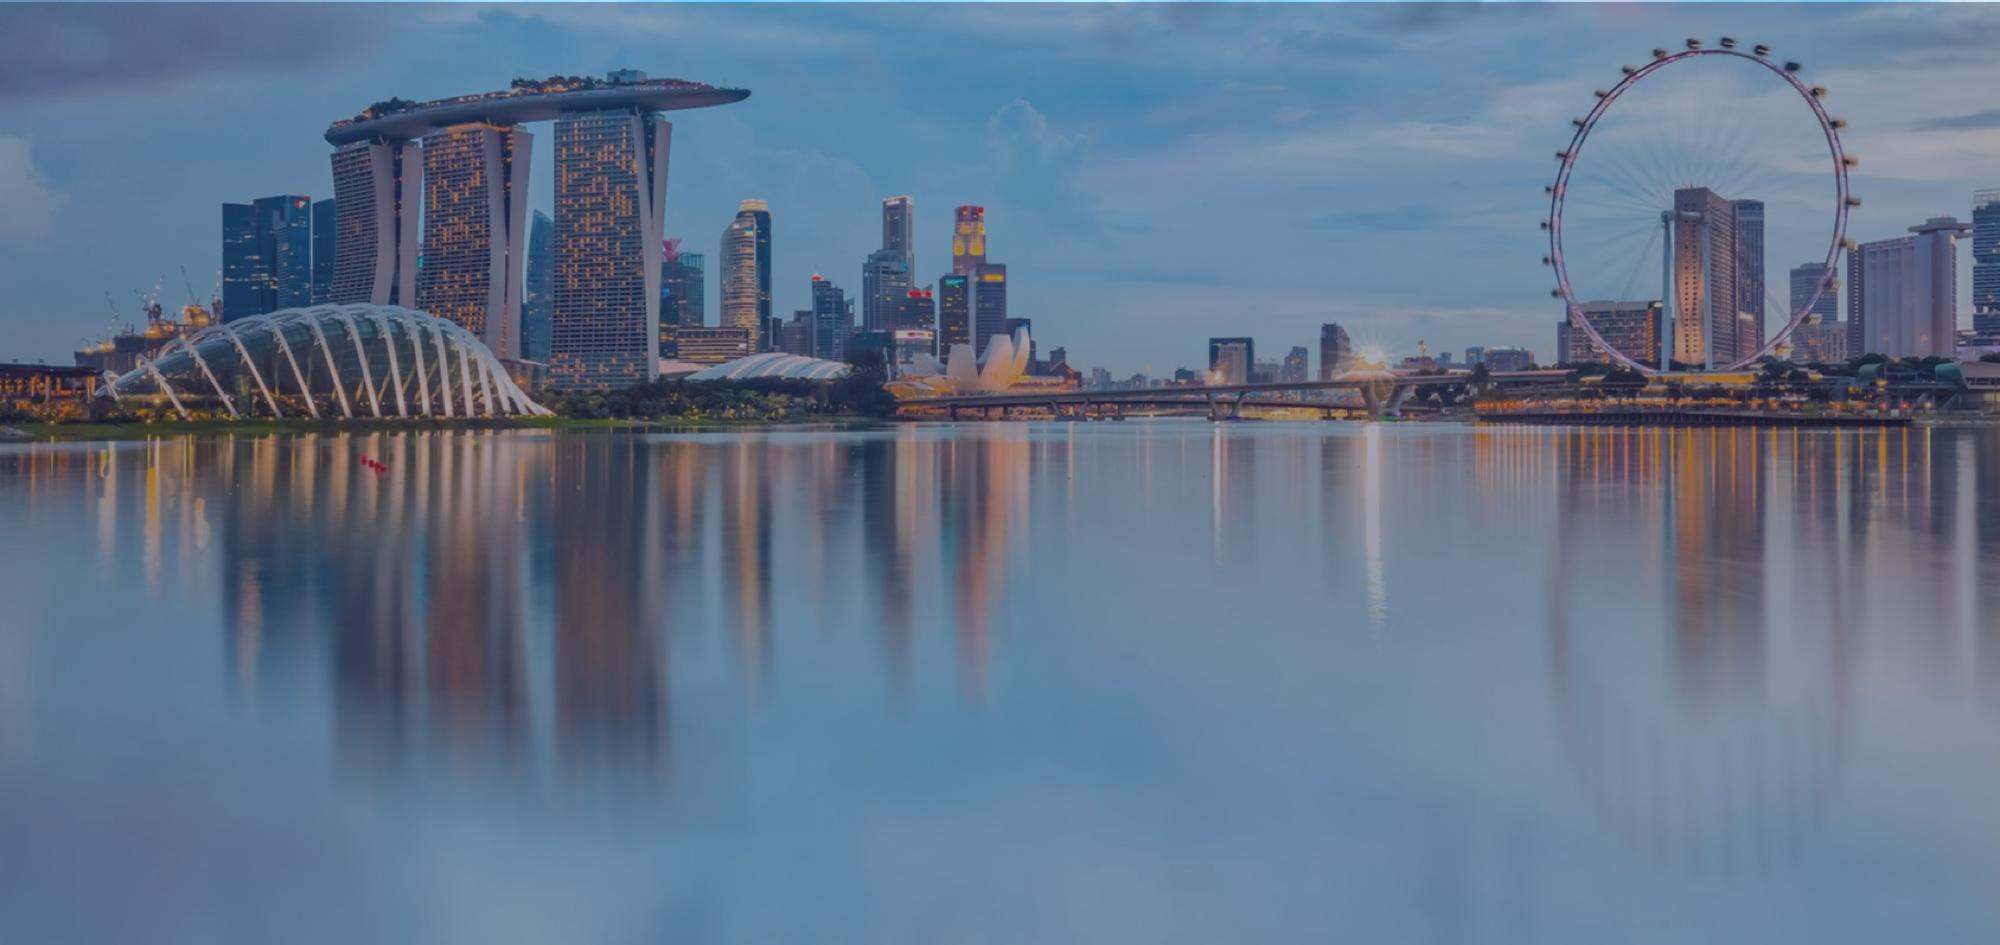 B2B Marketing Lab Singapore - Contact us